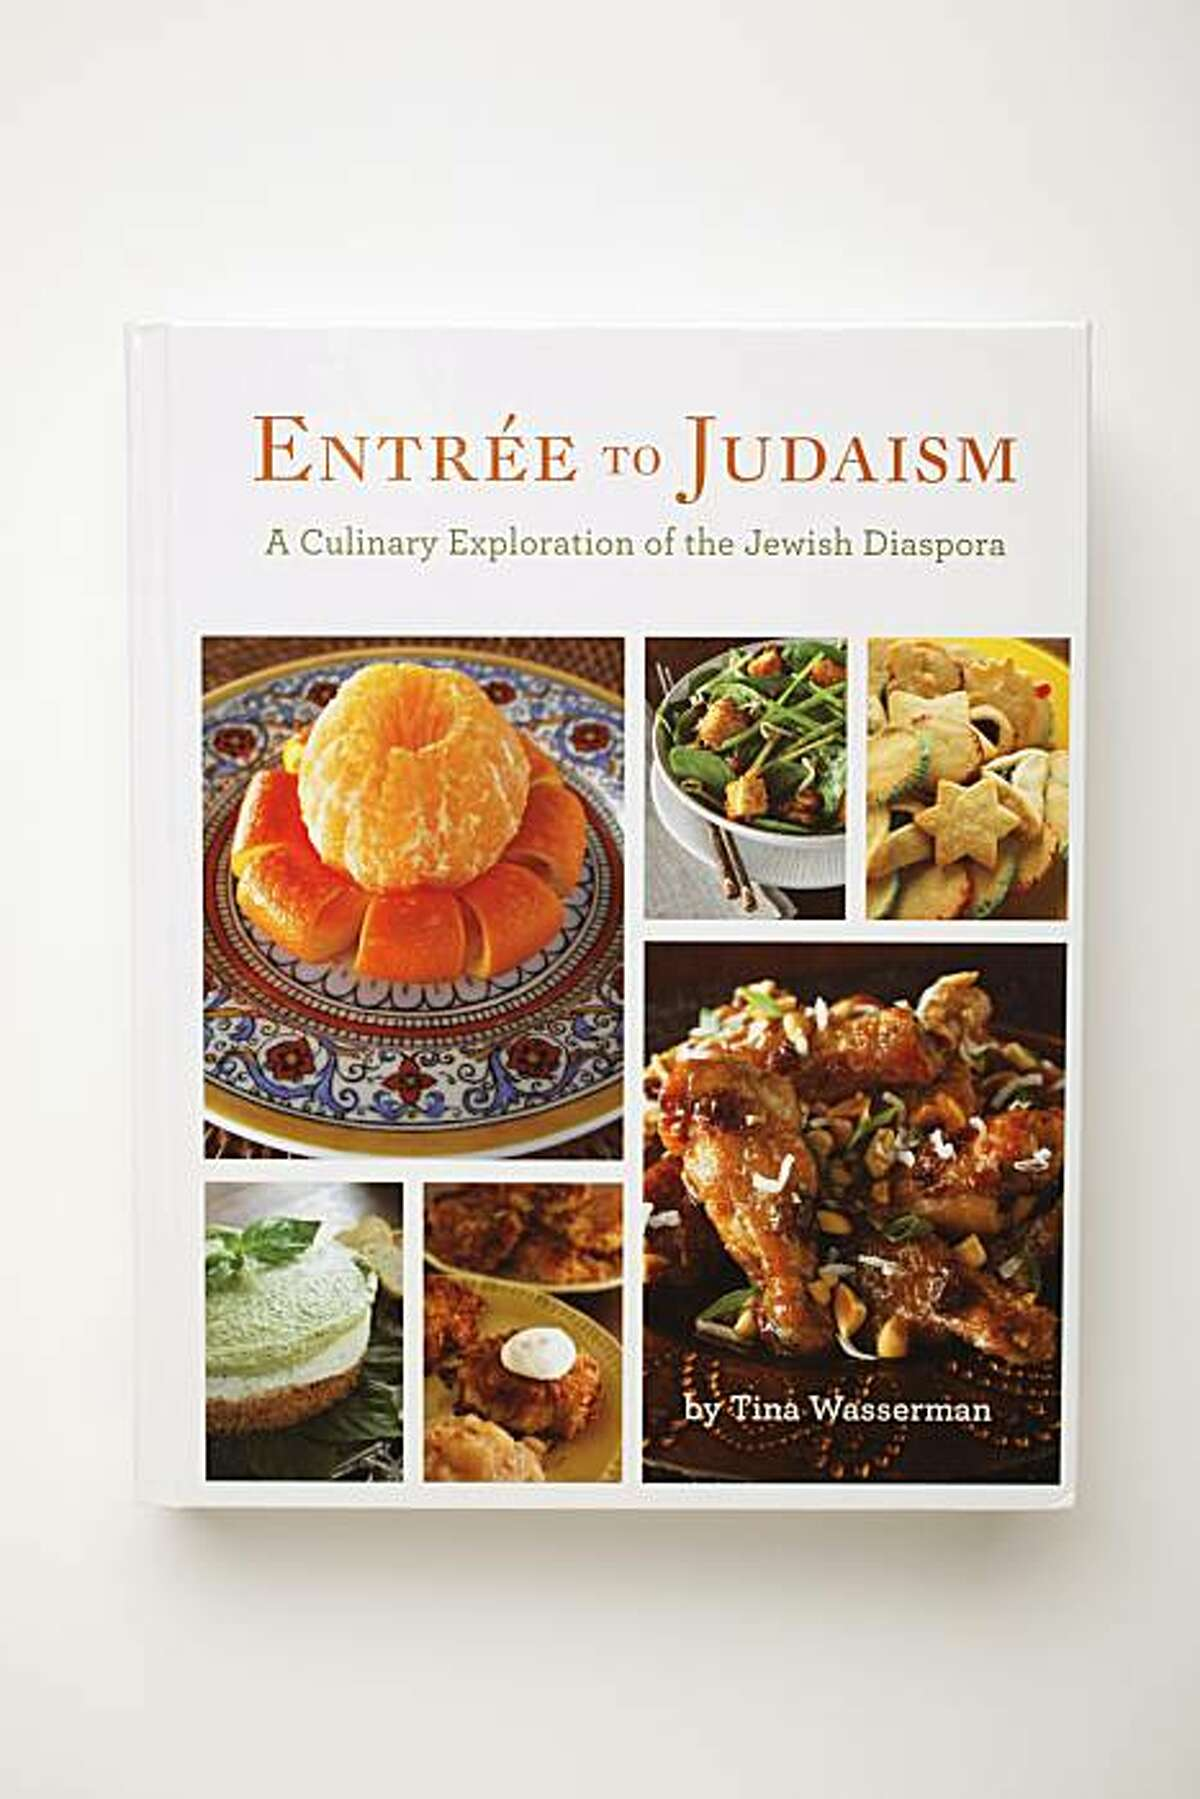 """Entry to Judiasm"" as seen in San Francisco, California, on March 9, 2011."